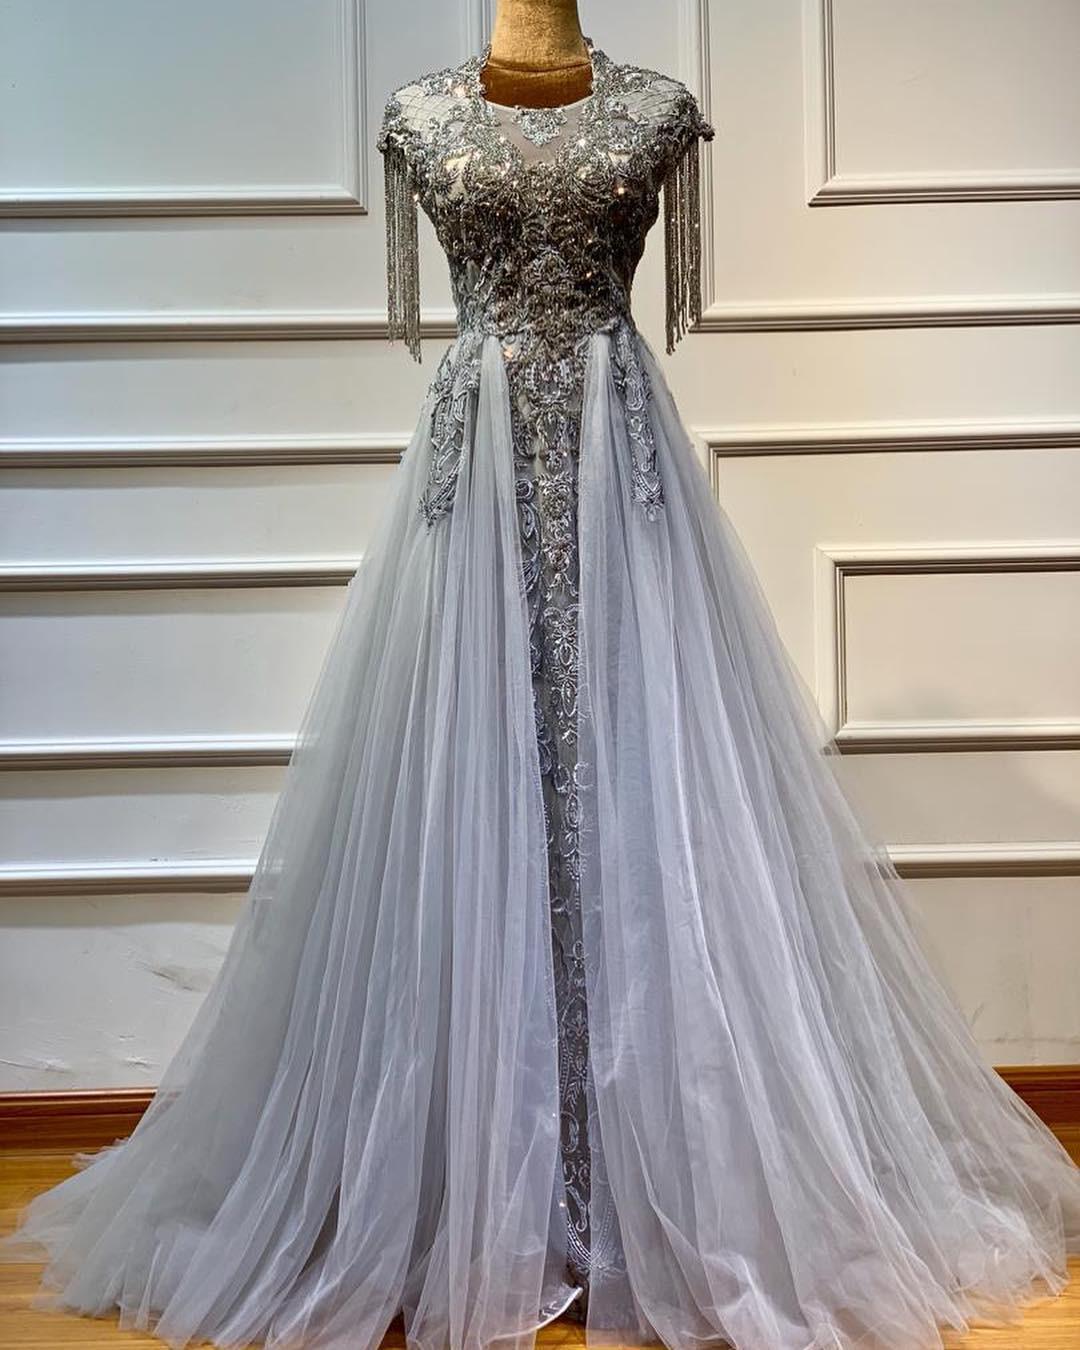 20 Kreativ Abendkleid Silber Bester Preis17 Einzigartig Abendkleid Silber Stylish